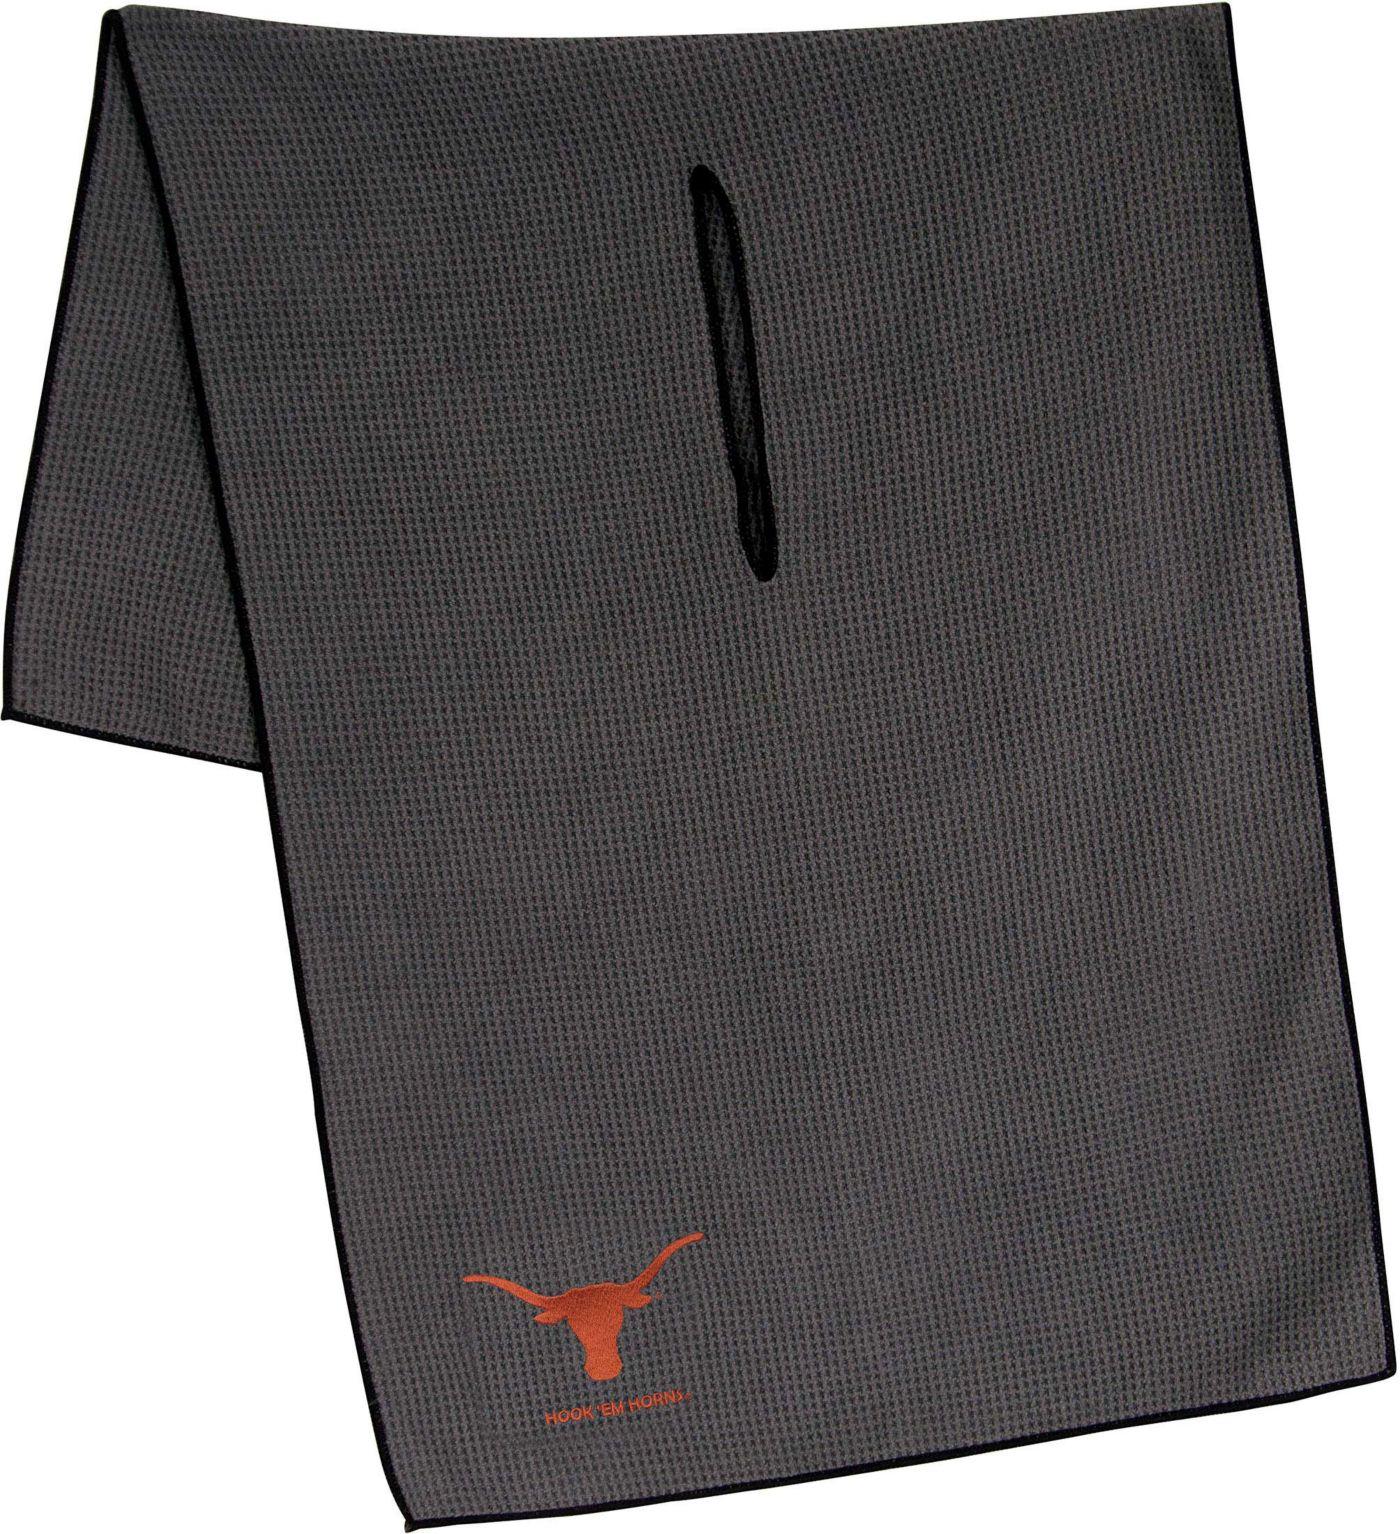 "Team Effort Texas Longhorns 19"" x 41"" Microfiber Golf Towel"